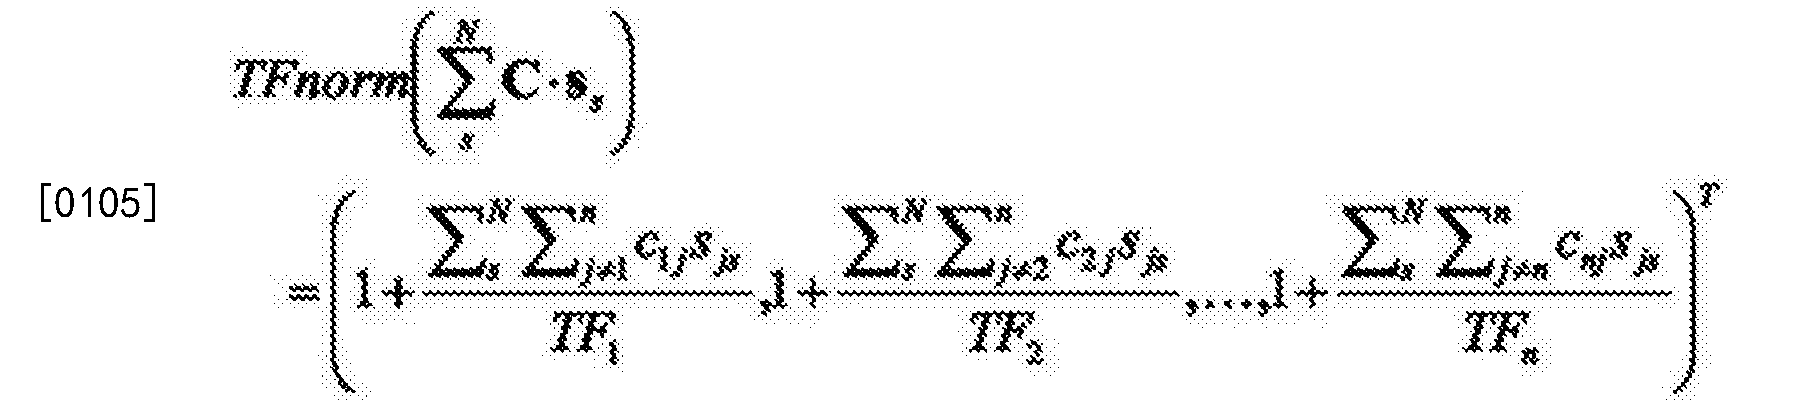 Figure CN107851097AD00152